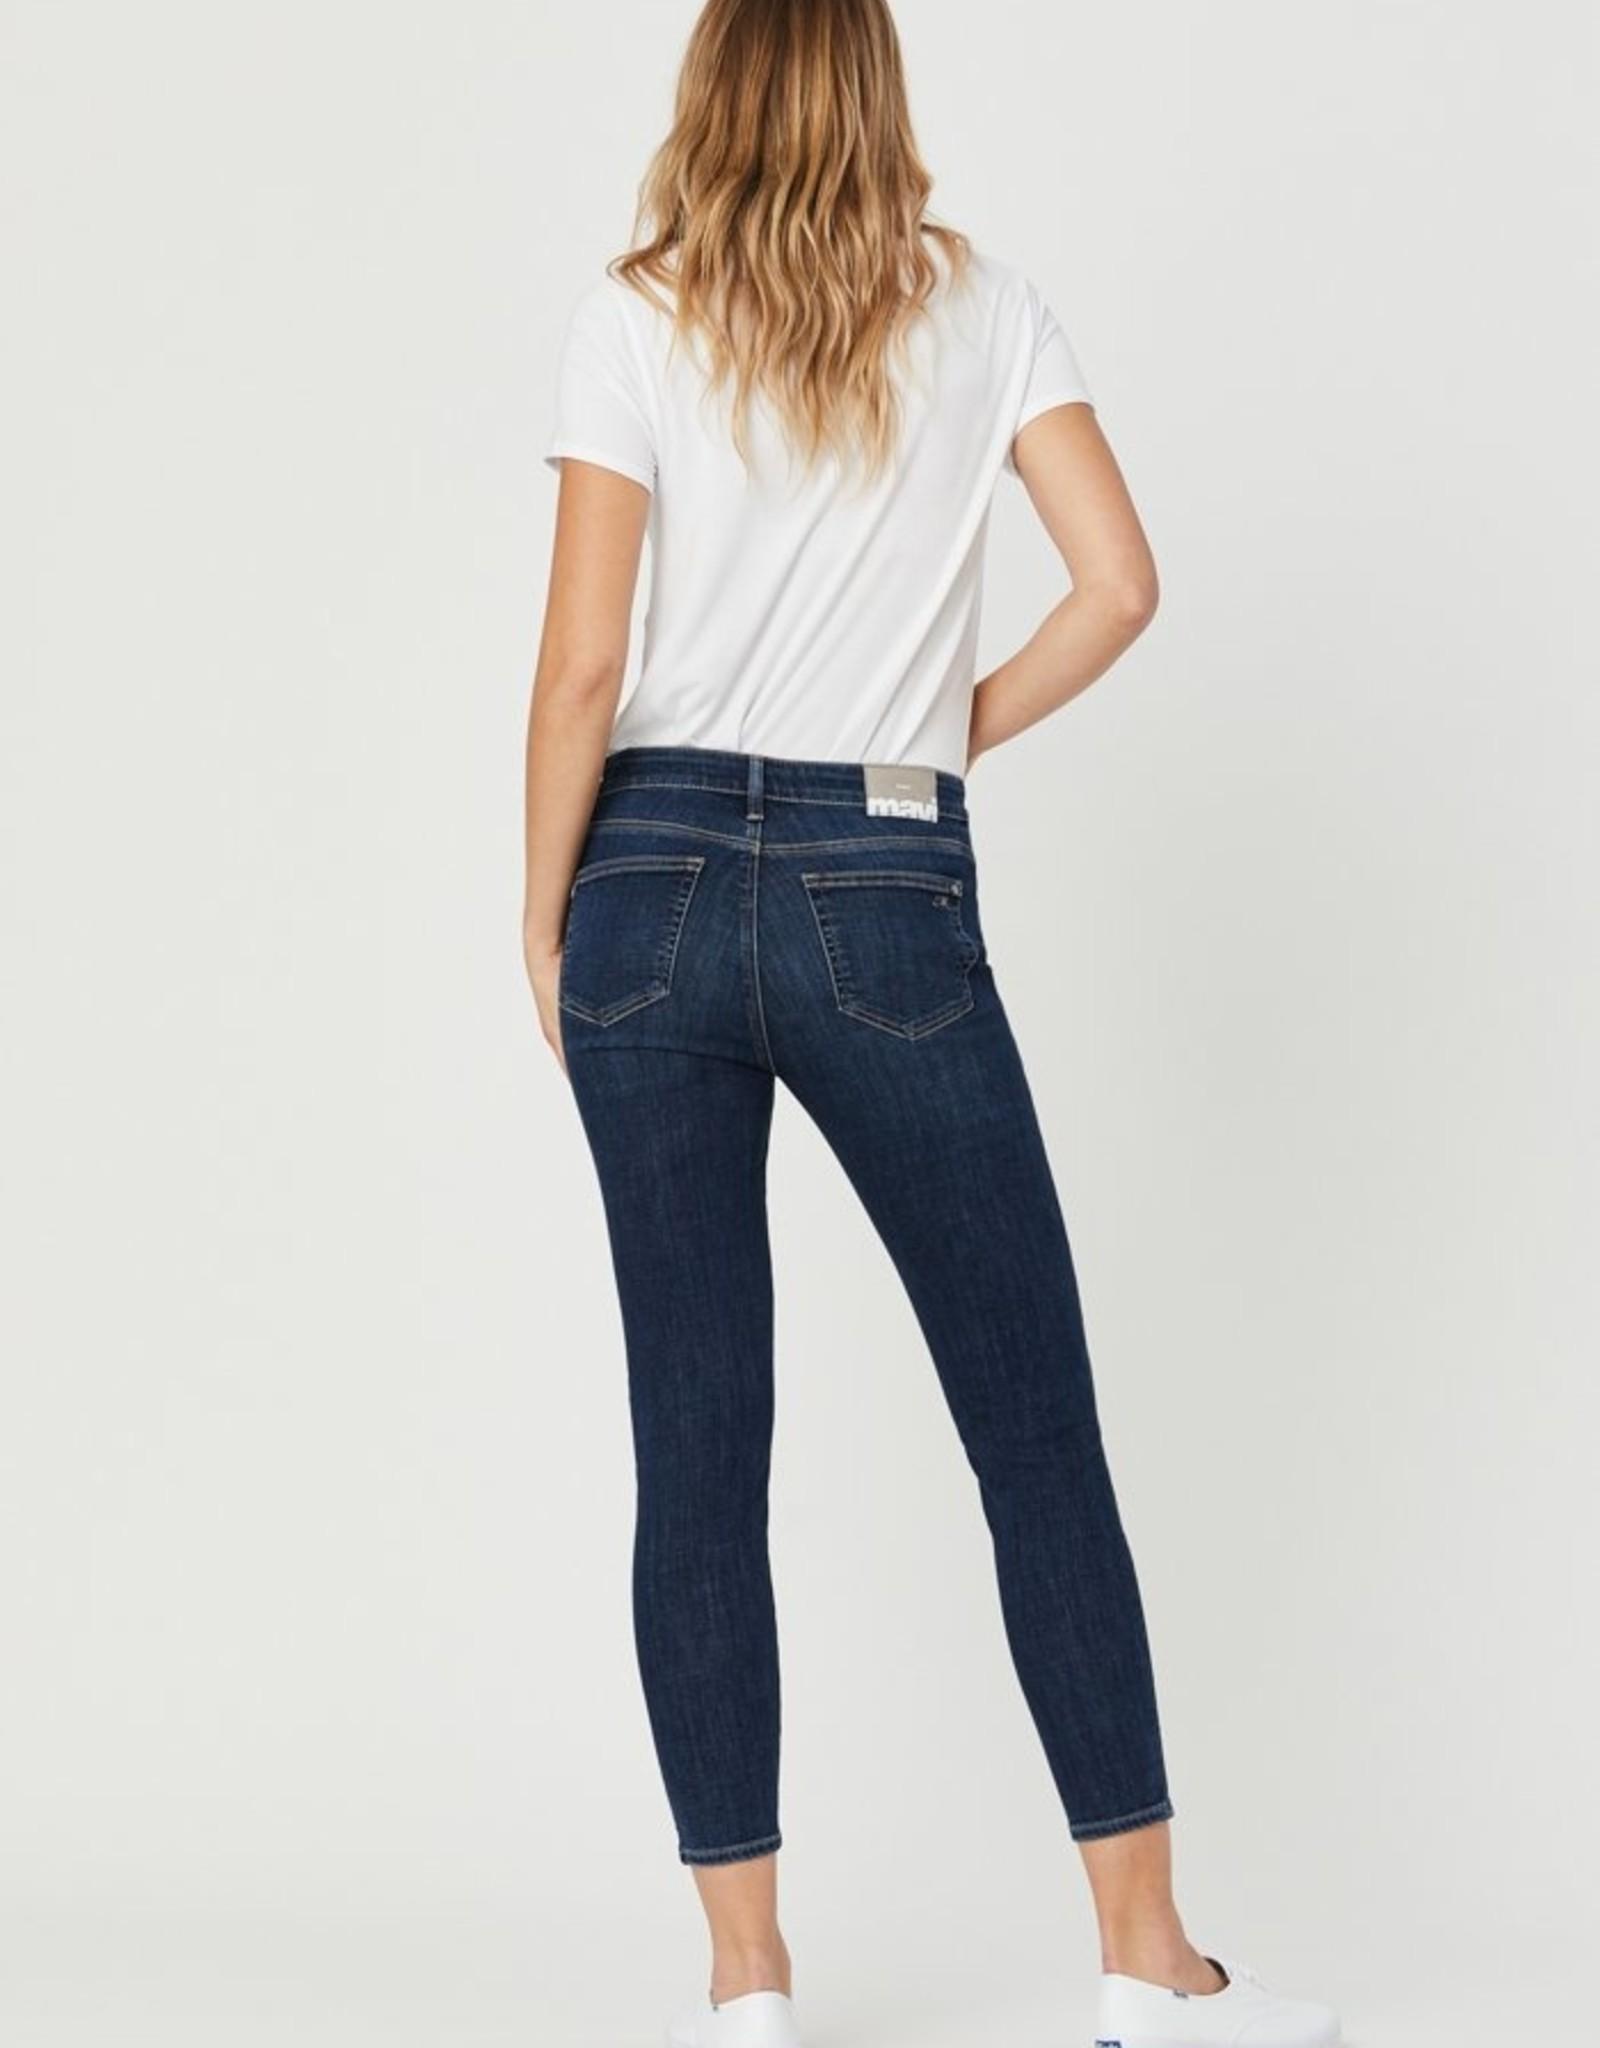 MAVI Jeans Scarlett Denim Jeans